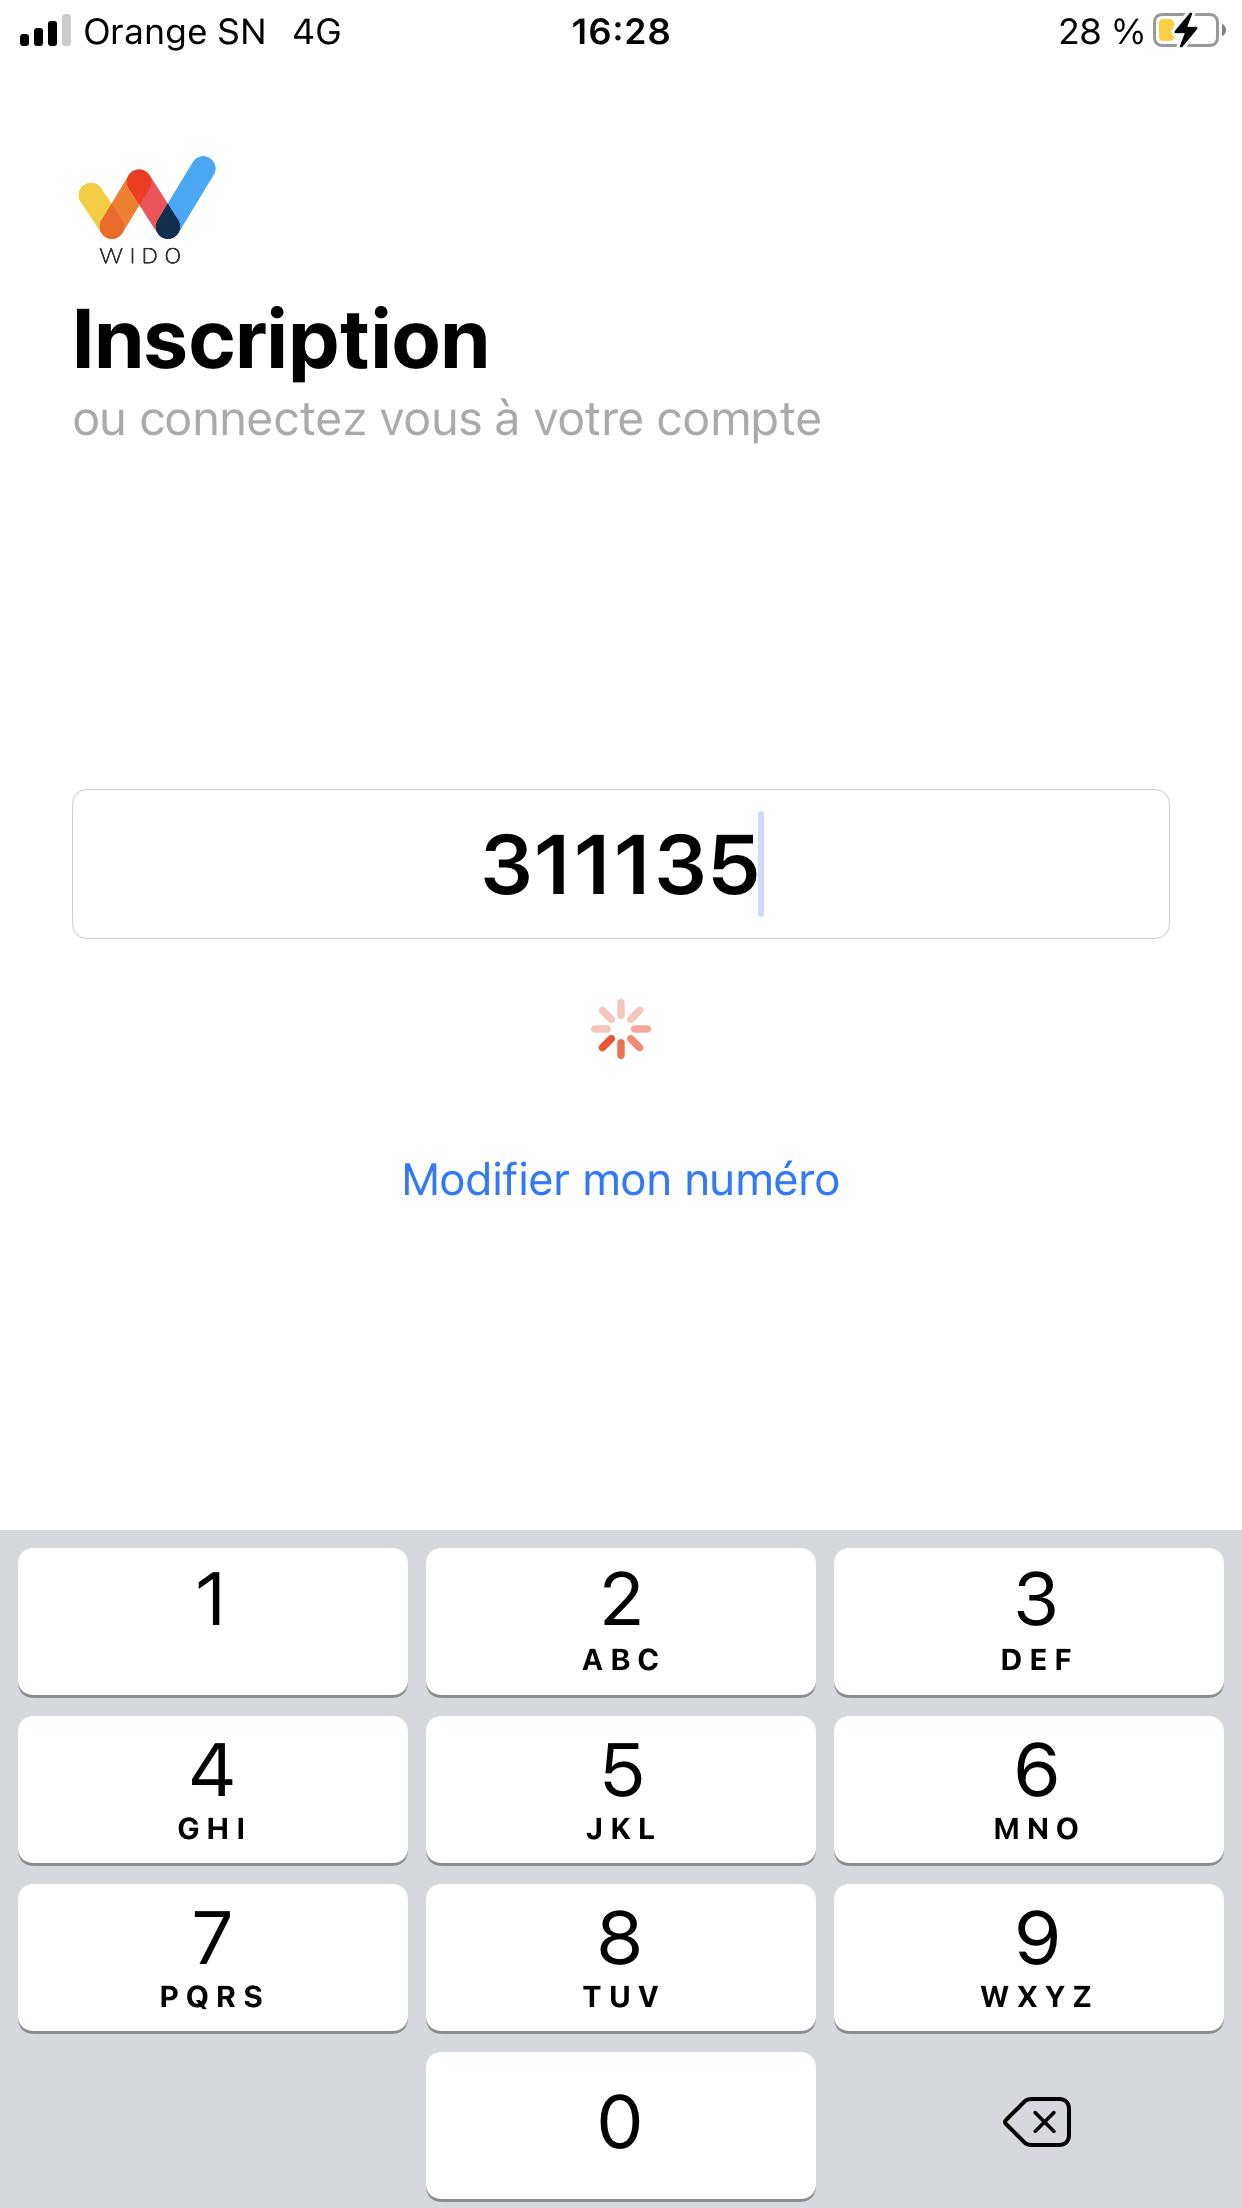 37AC6D26-F440-457E-85BA-0A6F8A368F53.png